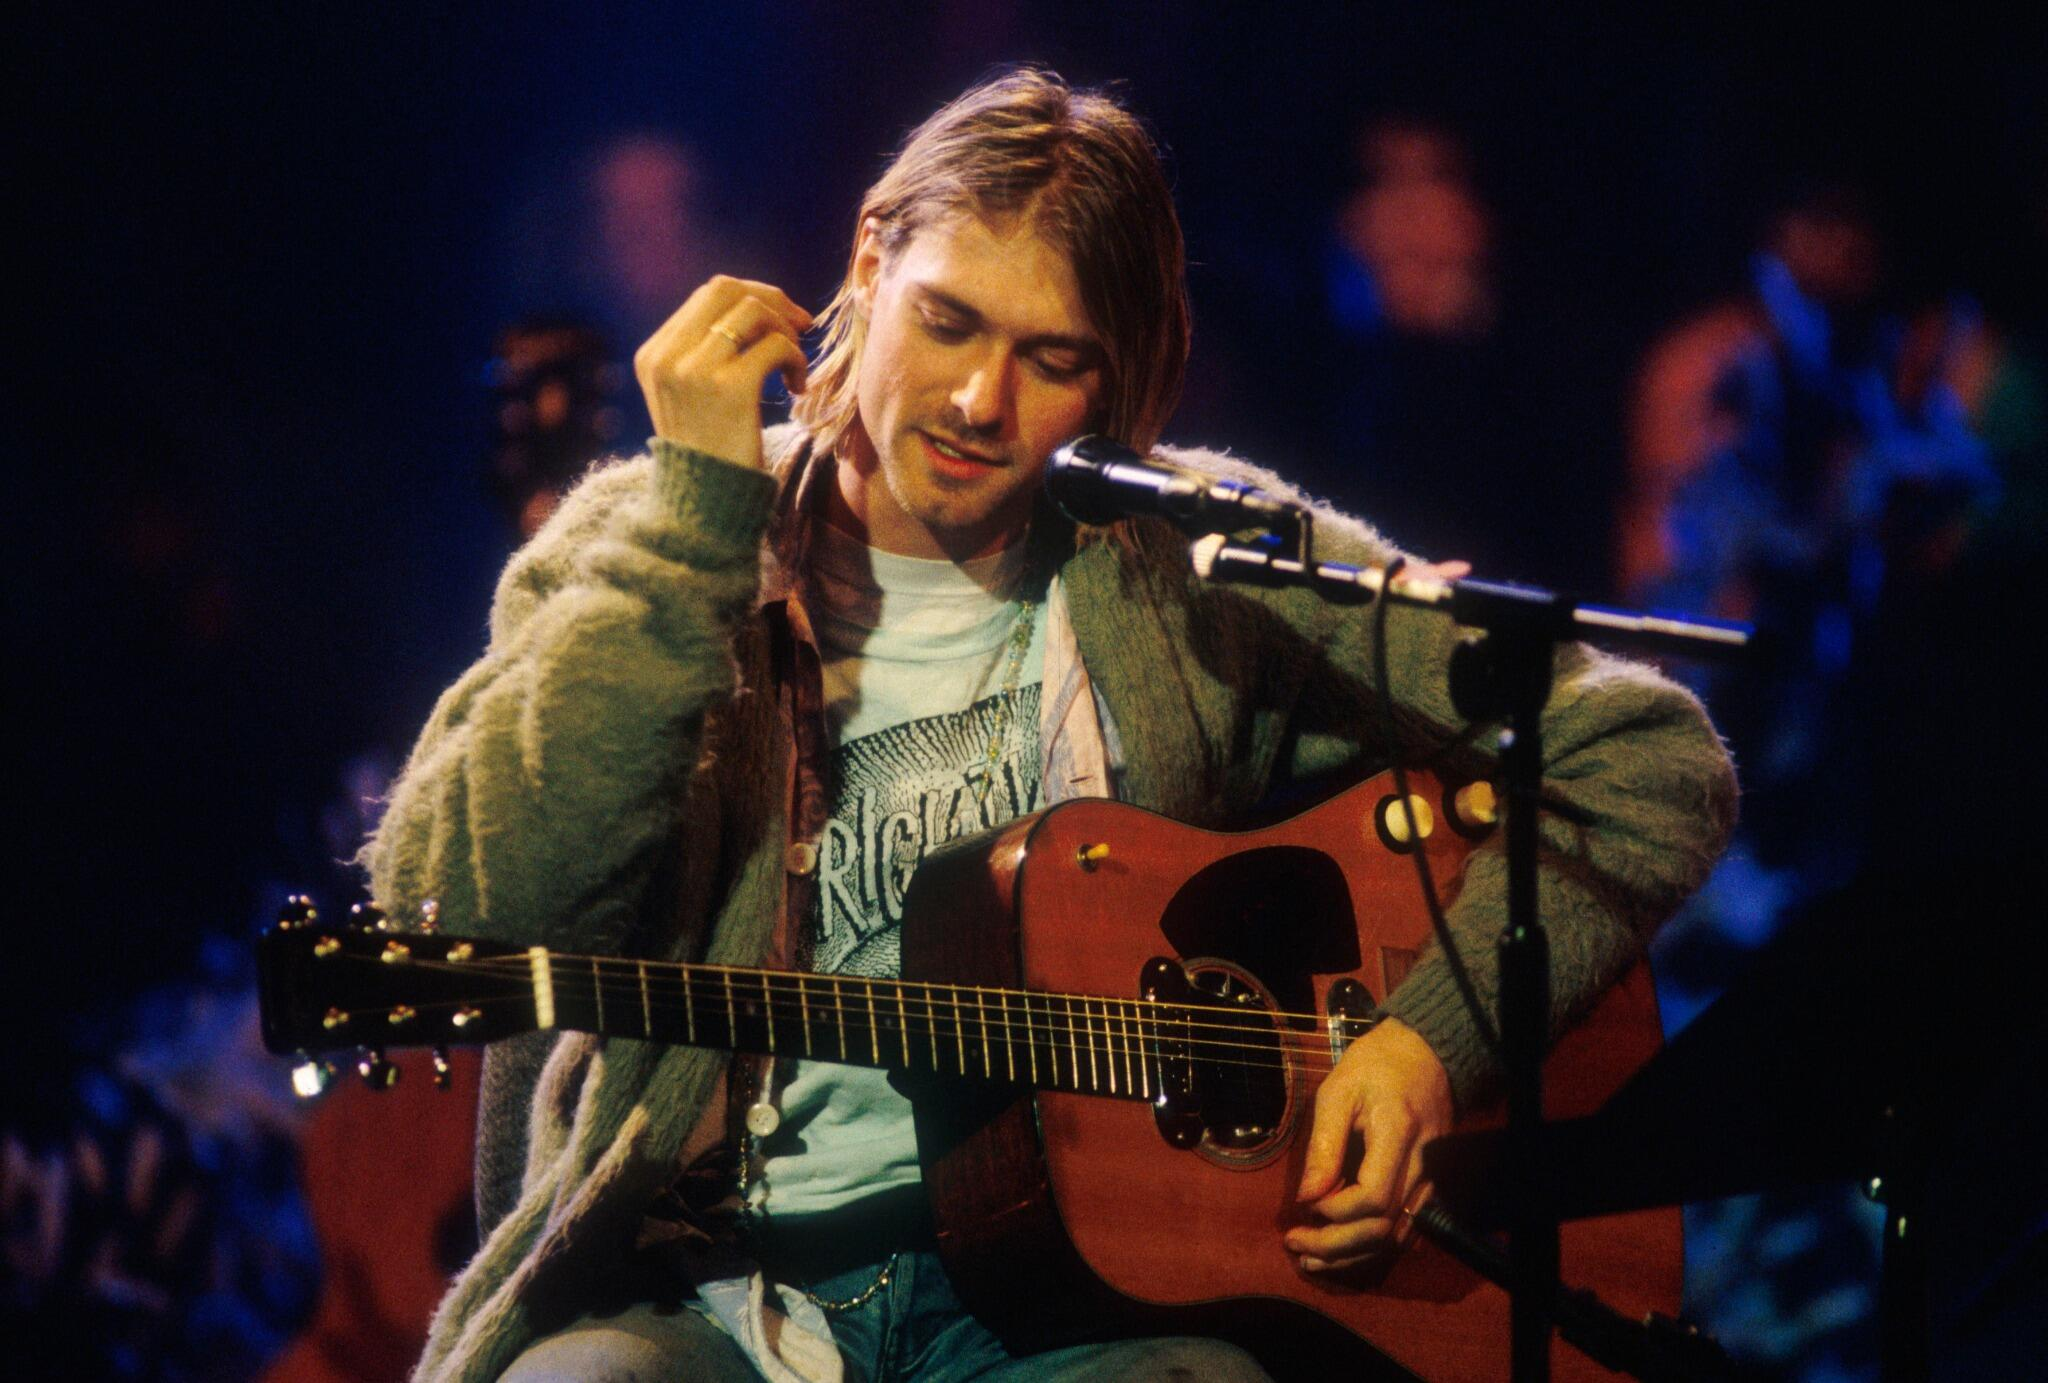 Kurt Cobain (November 18, 1993) #Nirvana #Unplugged #Grunge http://t.co/Fgk6oQT3lK